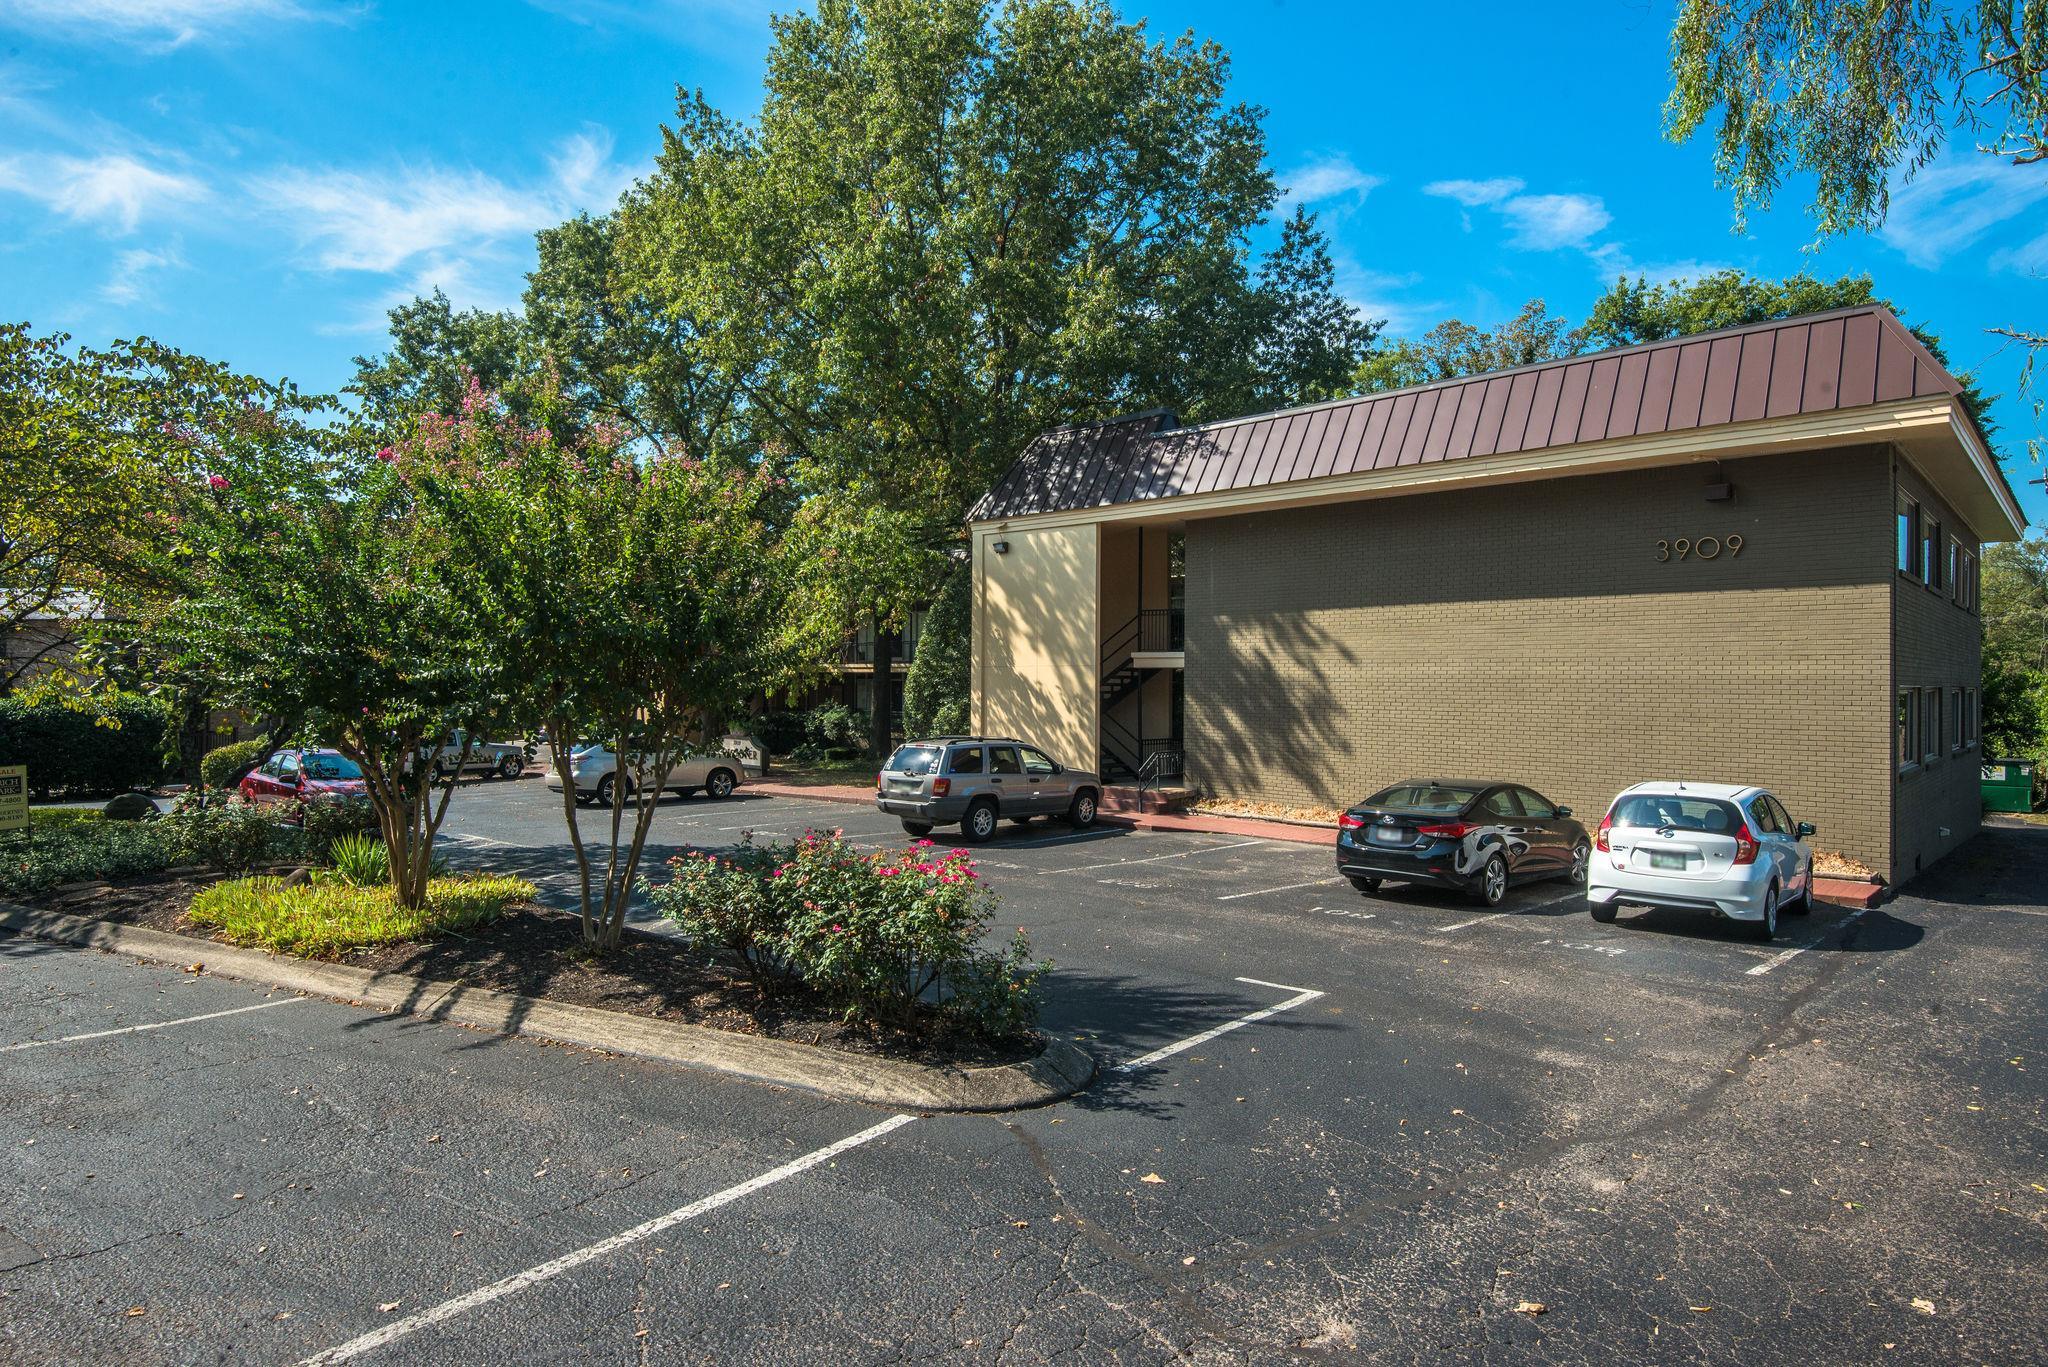 3909 Whitland Ave, Nashville, TN 37205 - Nashville, TN real estate listing